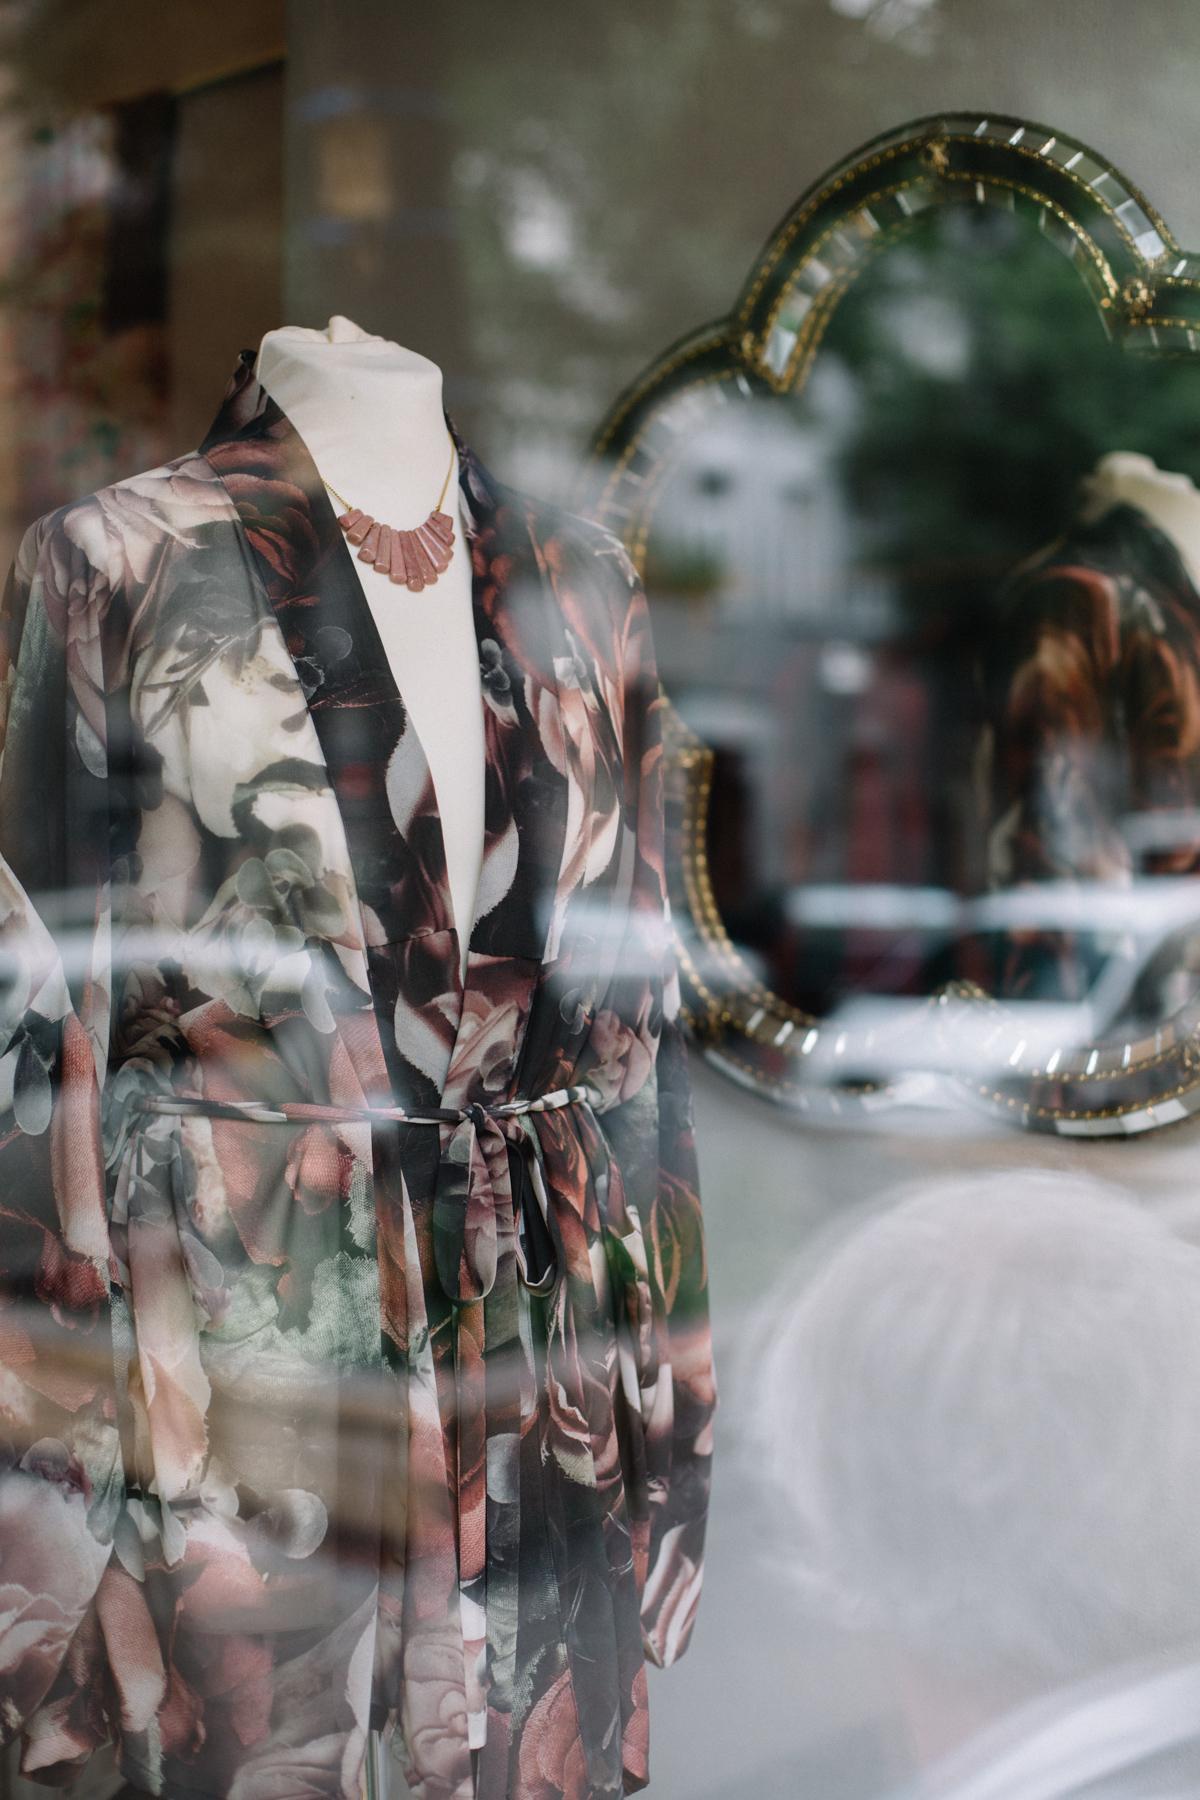 kimonos-berlin-shopping.jpg